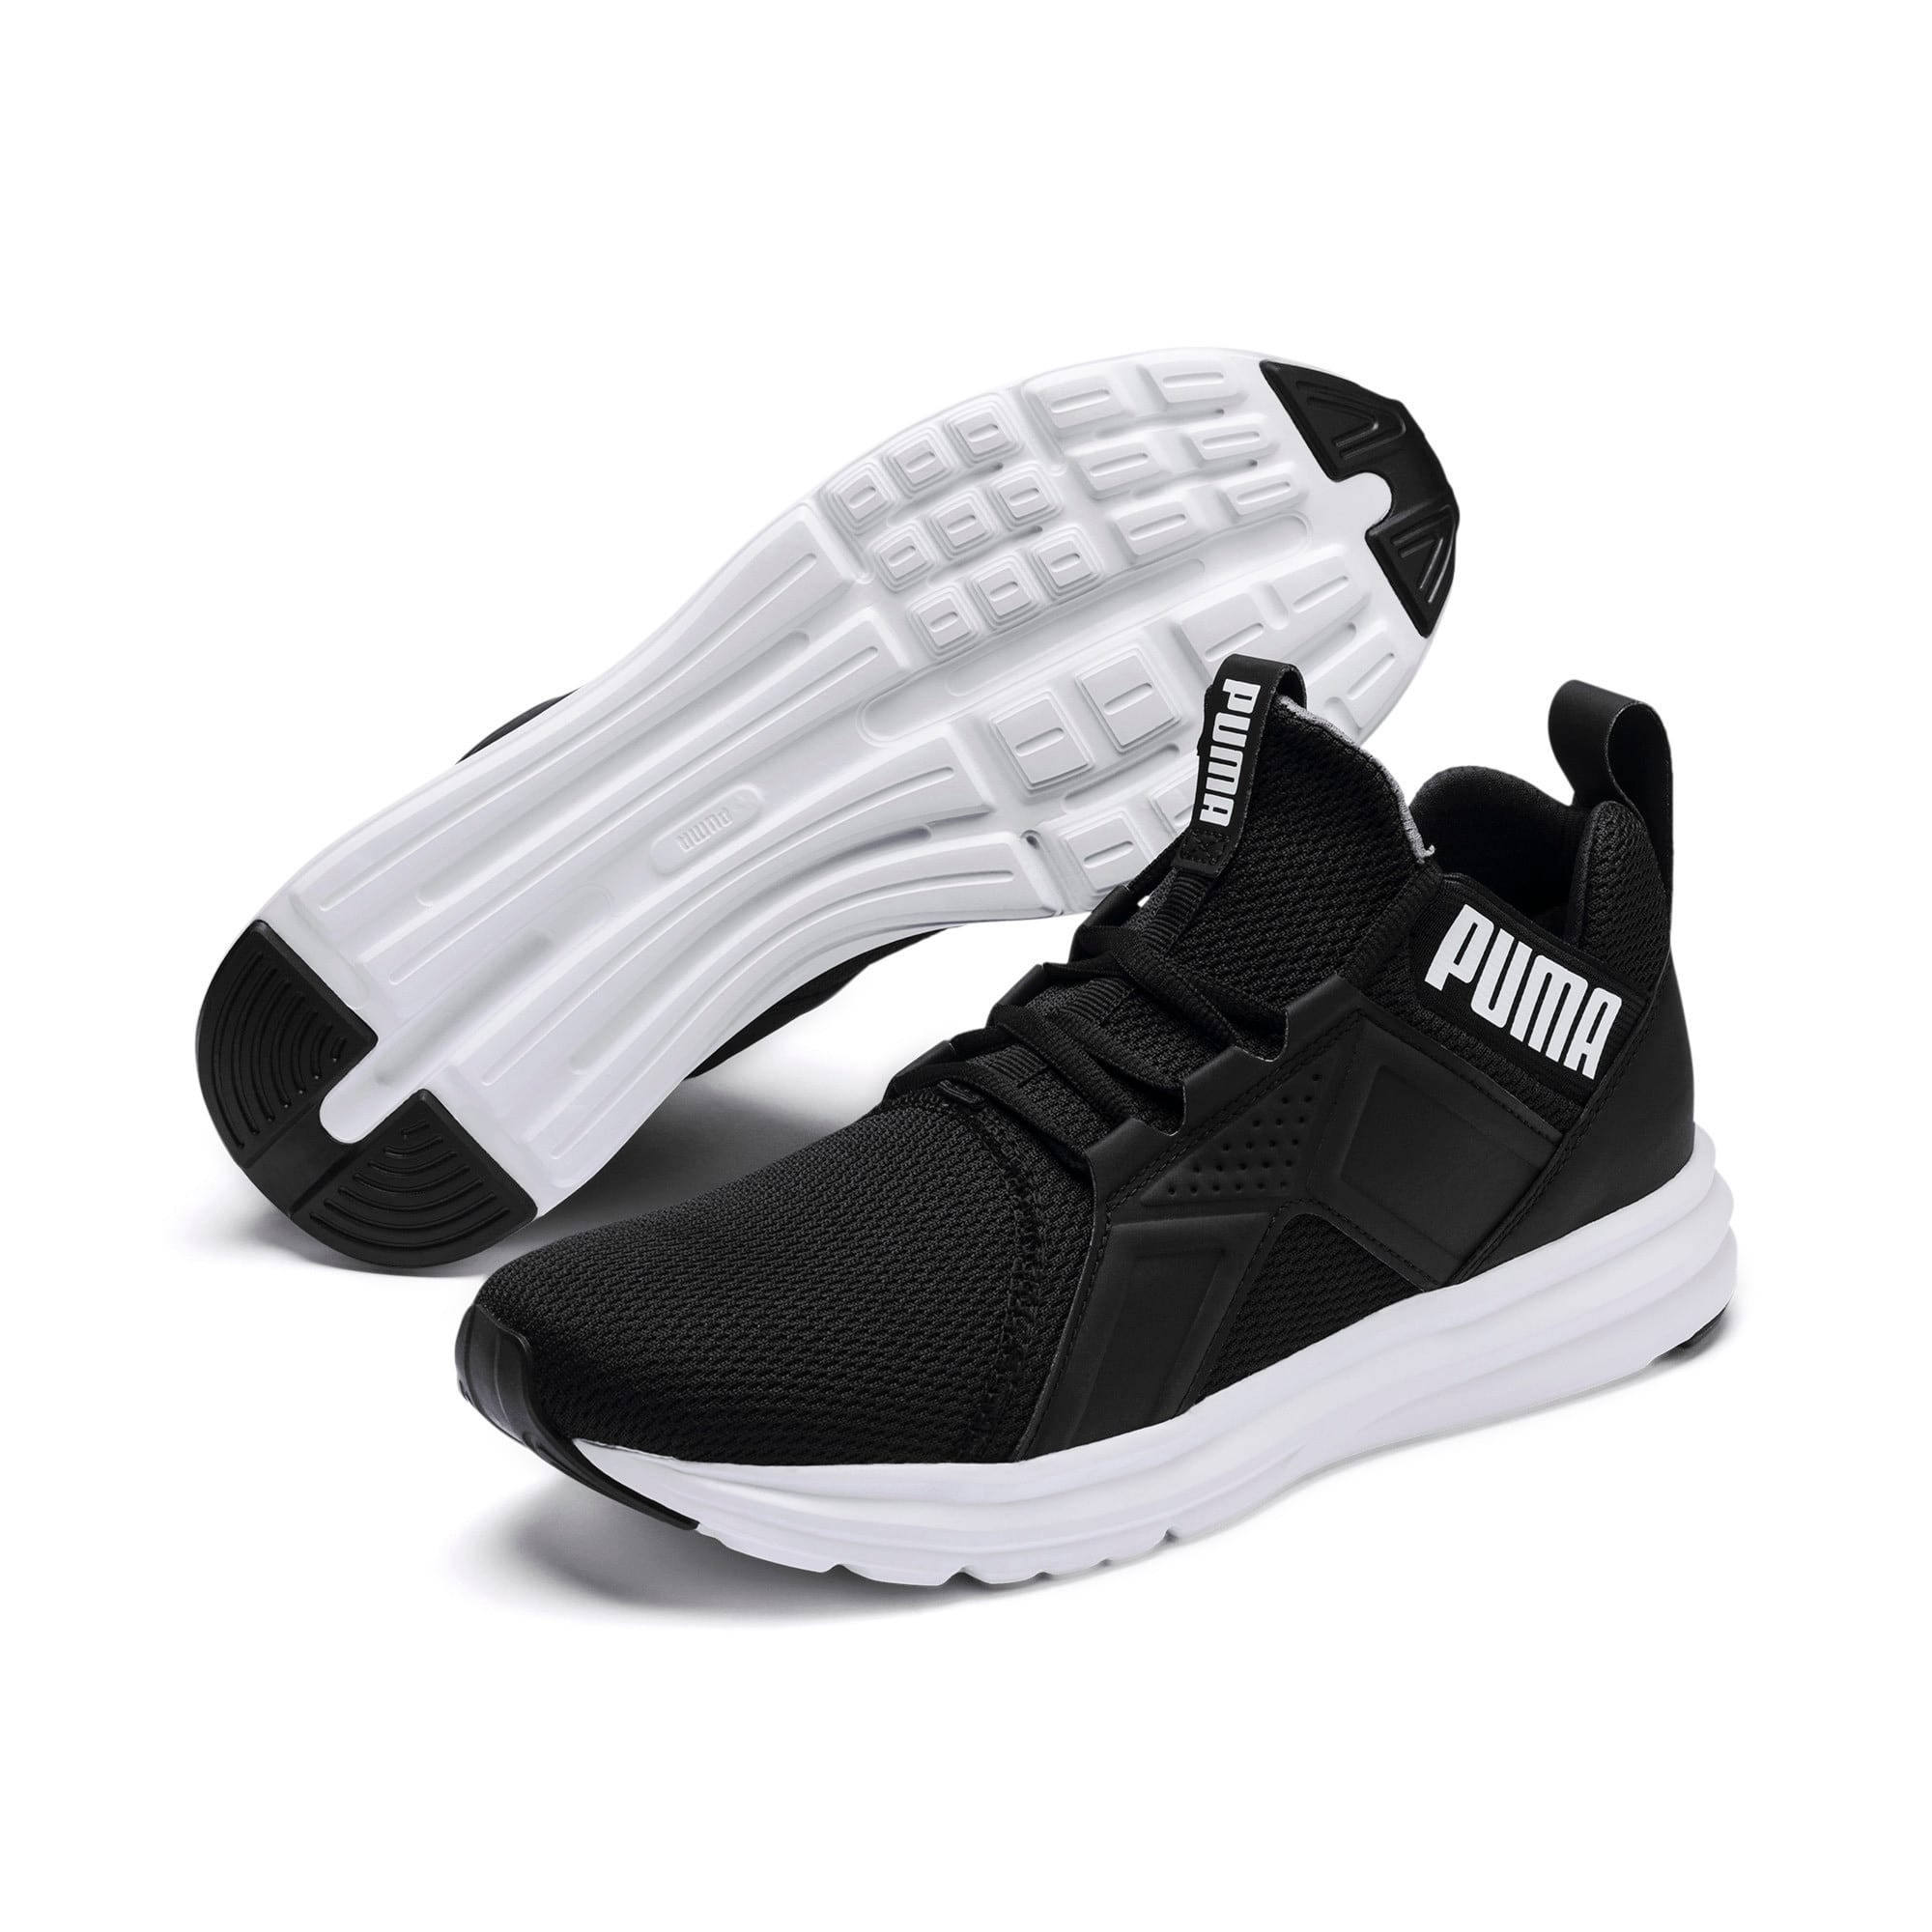 Thumbnail 3 of Enzo sportschoenen voor heren, Puma Black-Puma White, medium